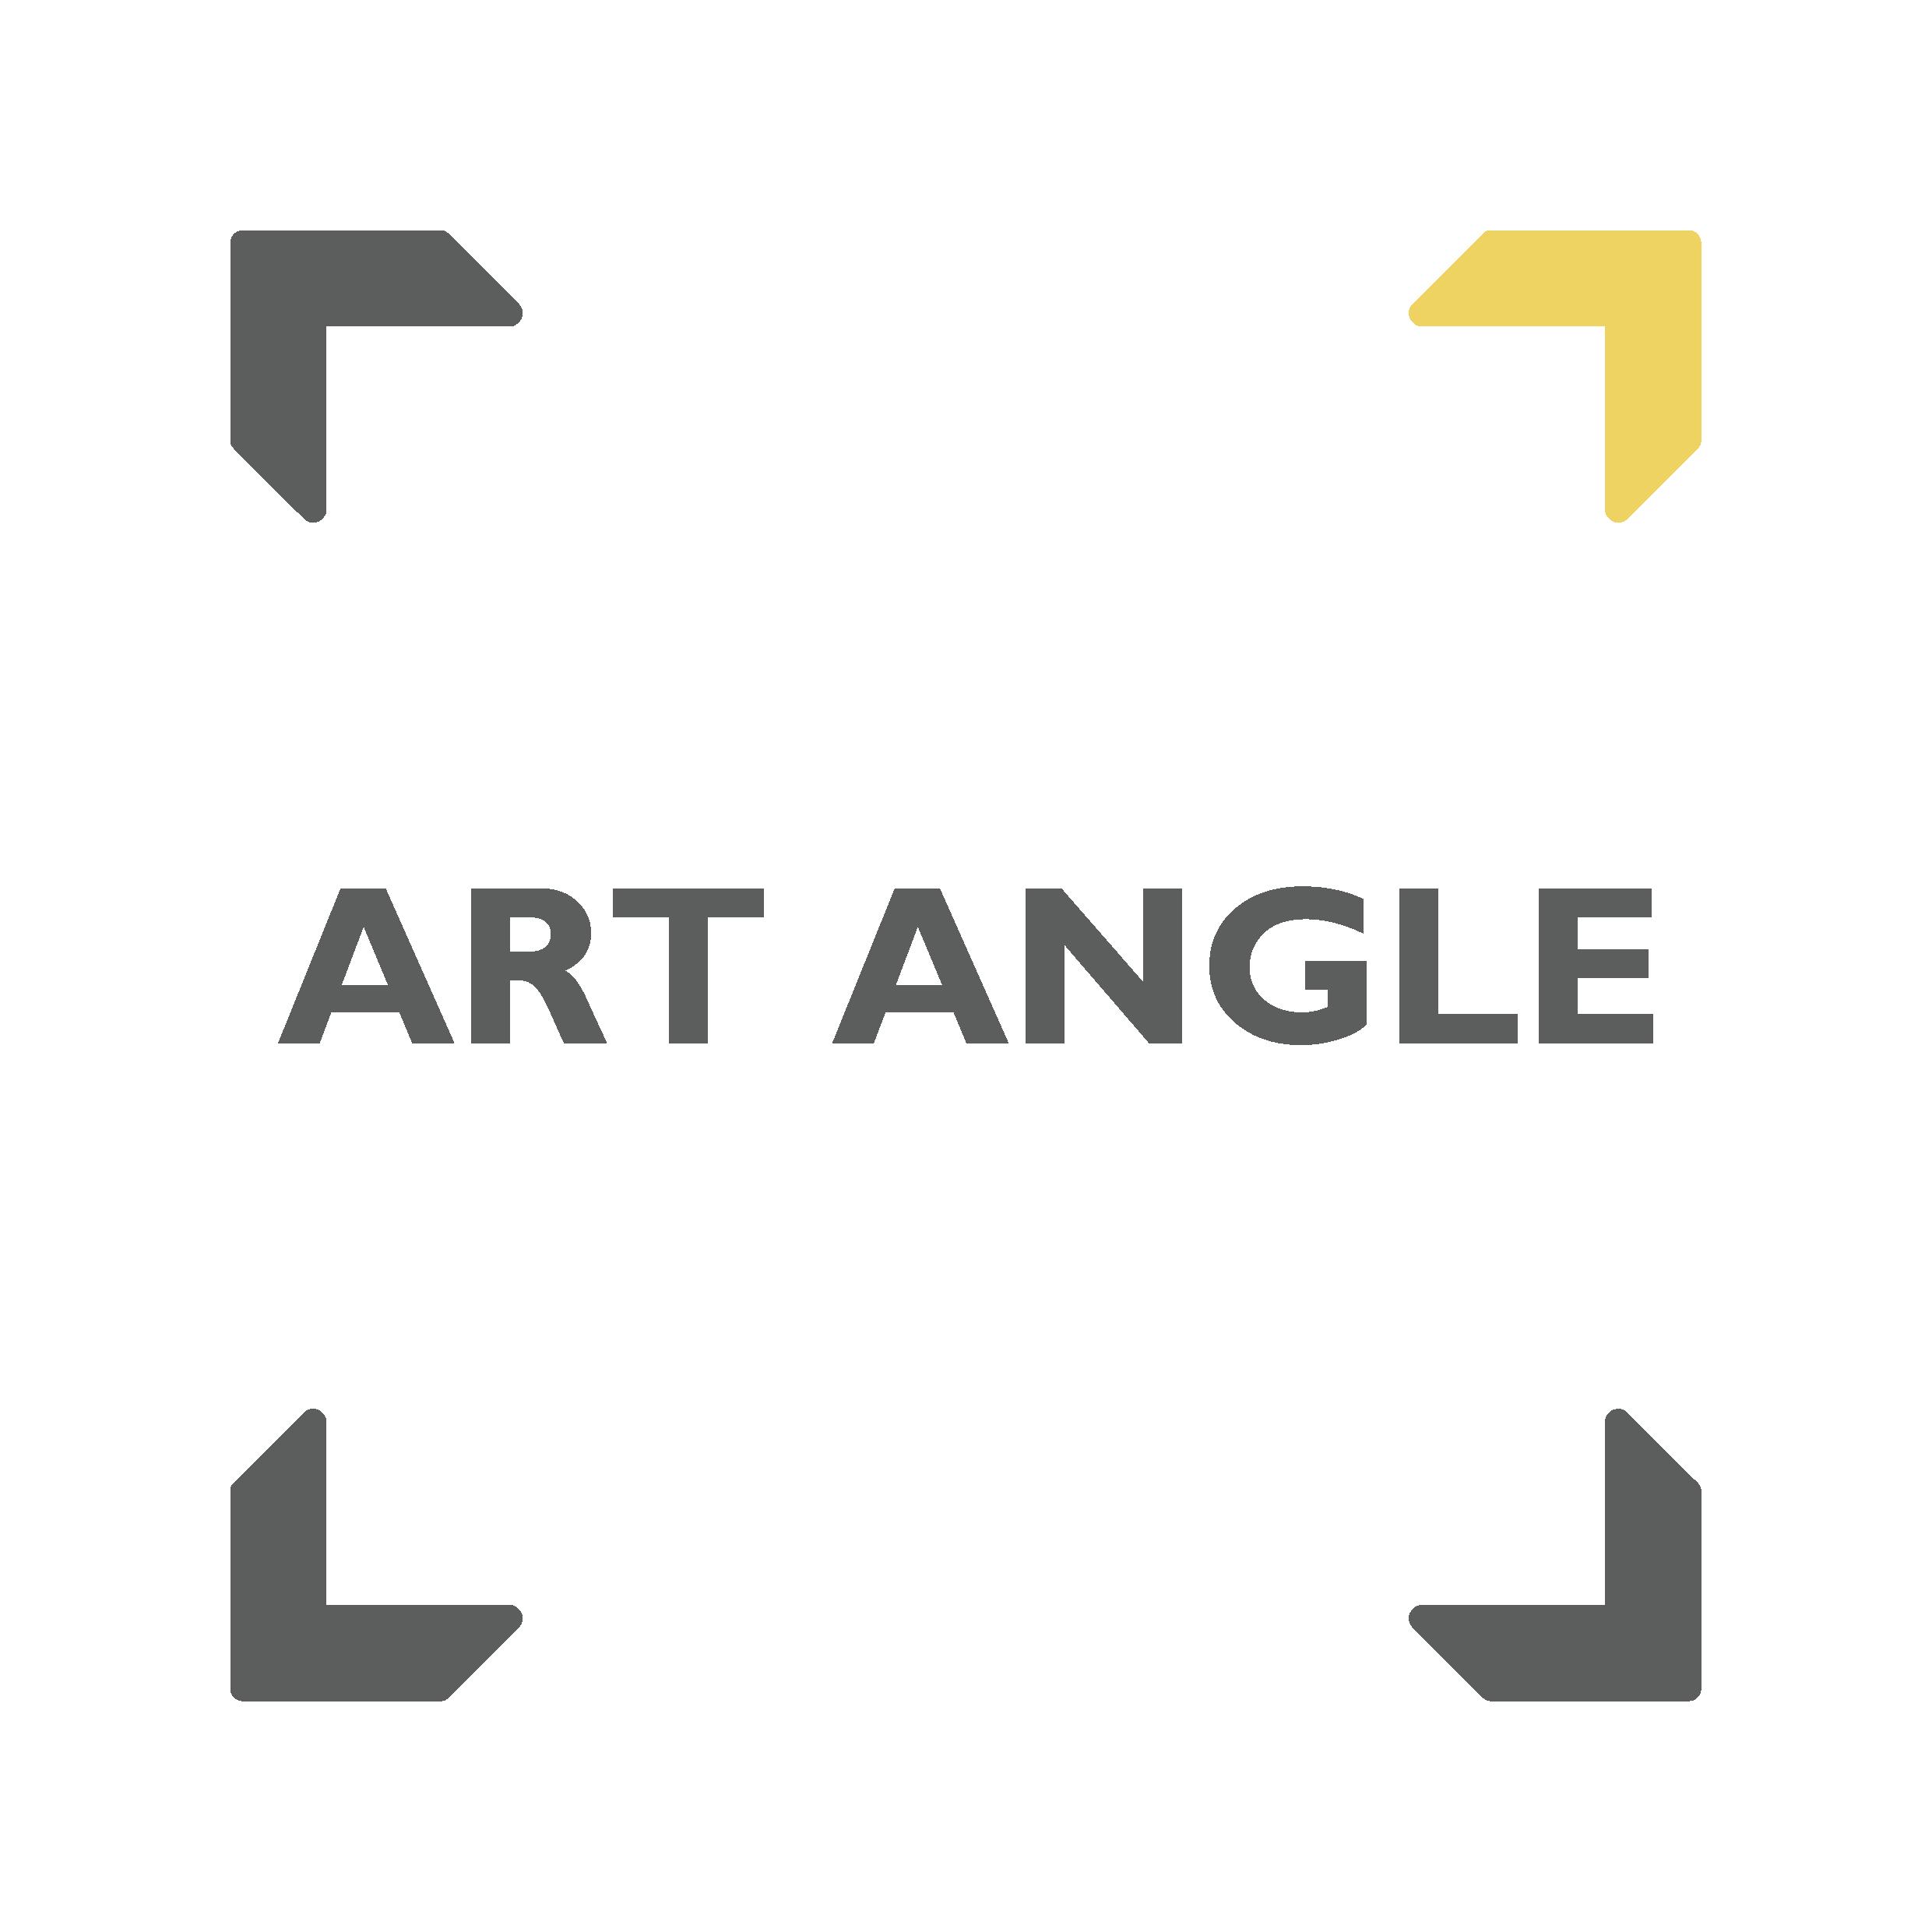 Artangle LOGO-01